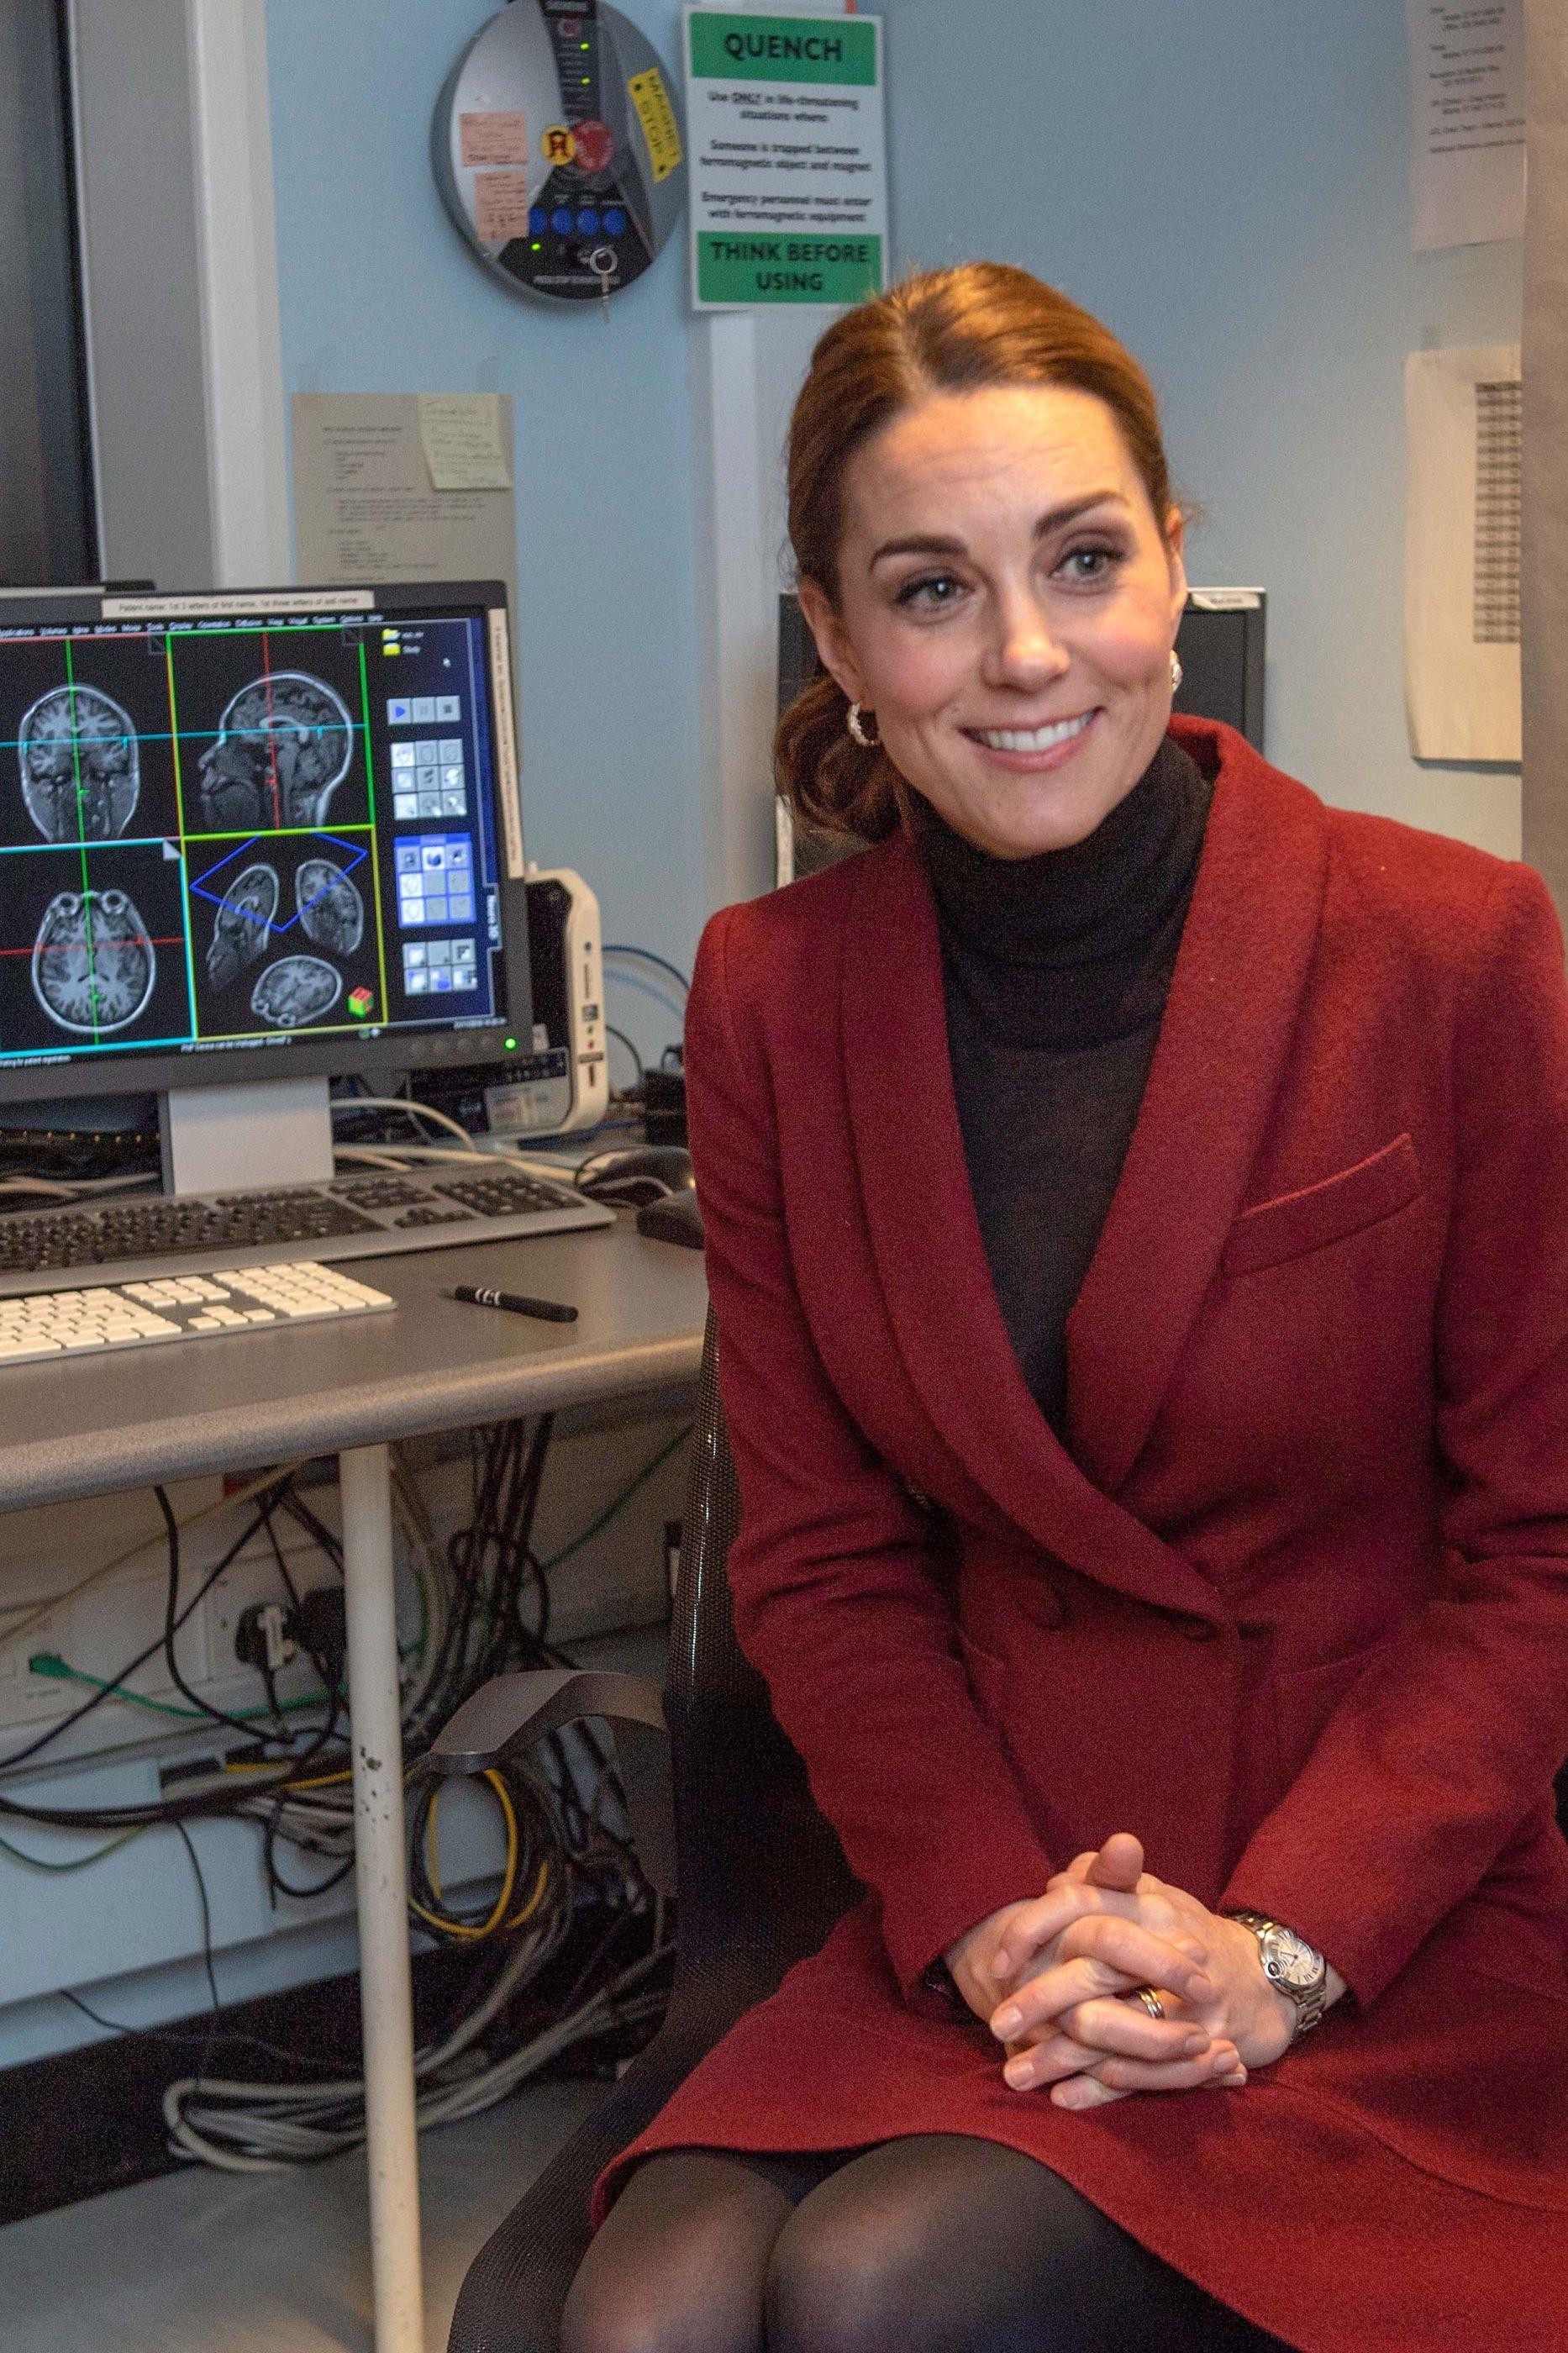 Kate Middleton revela 'pequeno segredo' dos seus tempos na universidade